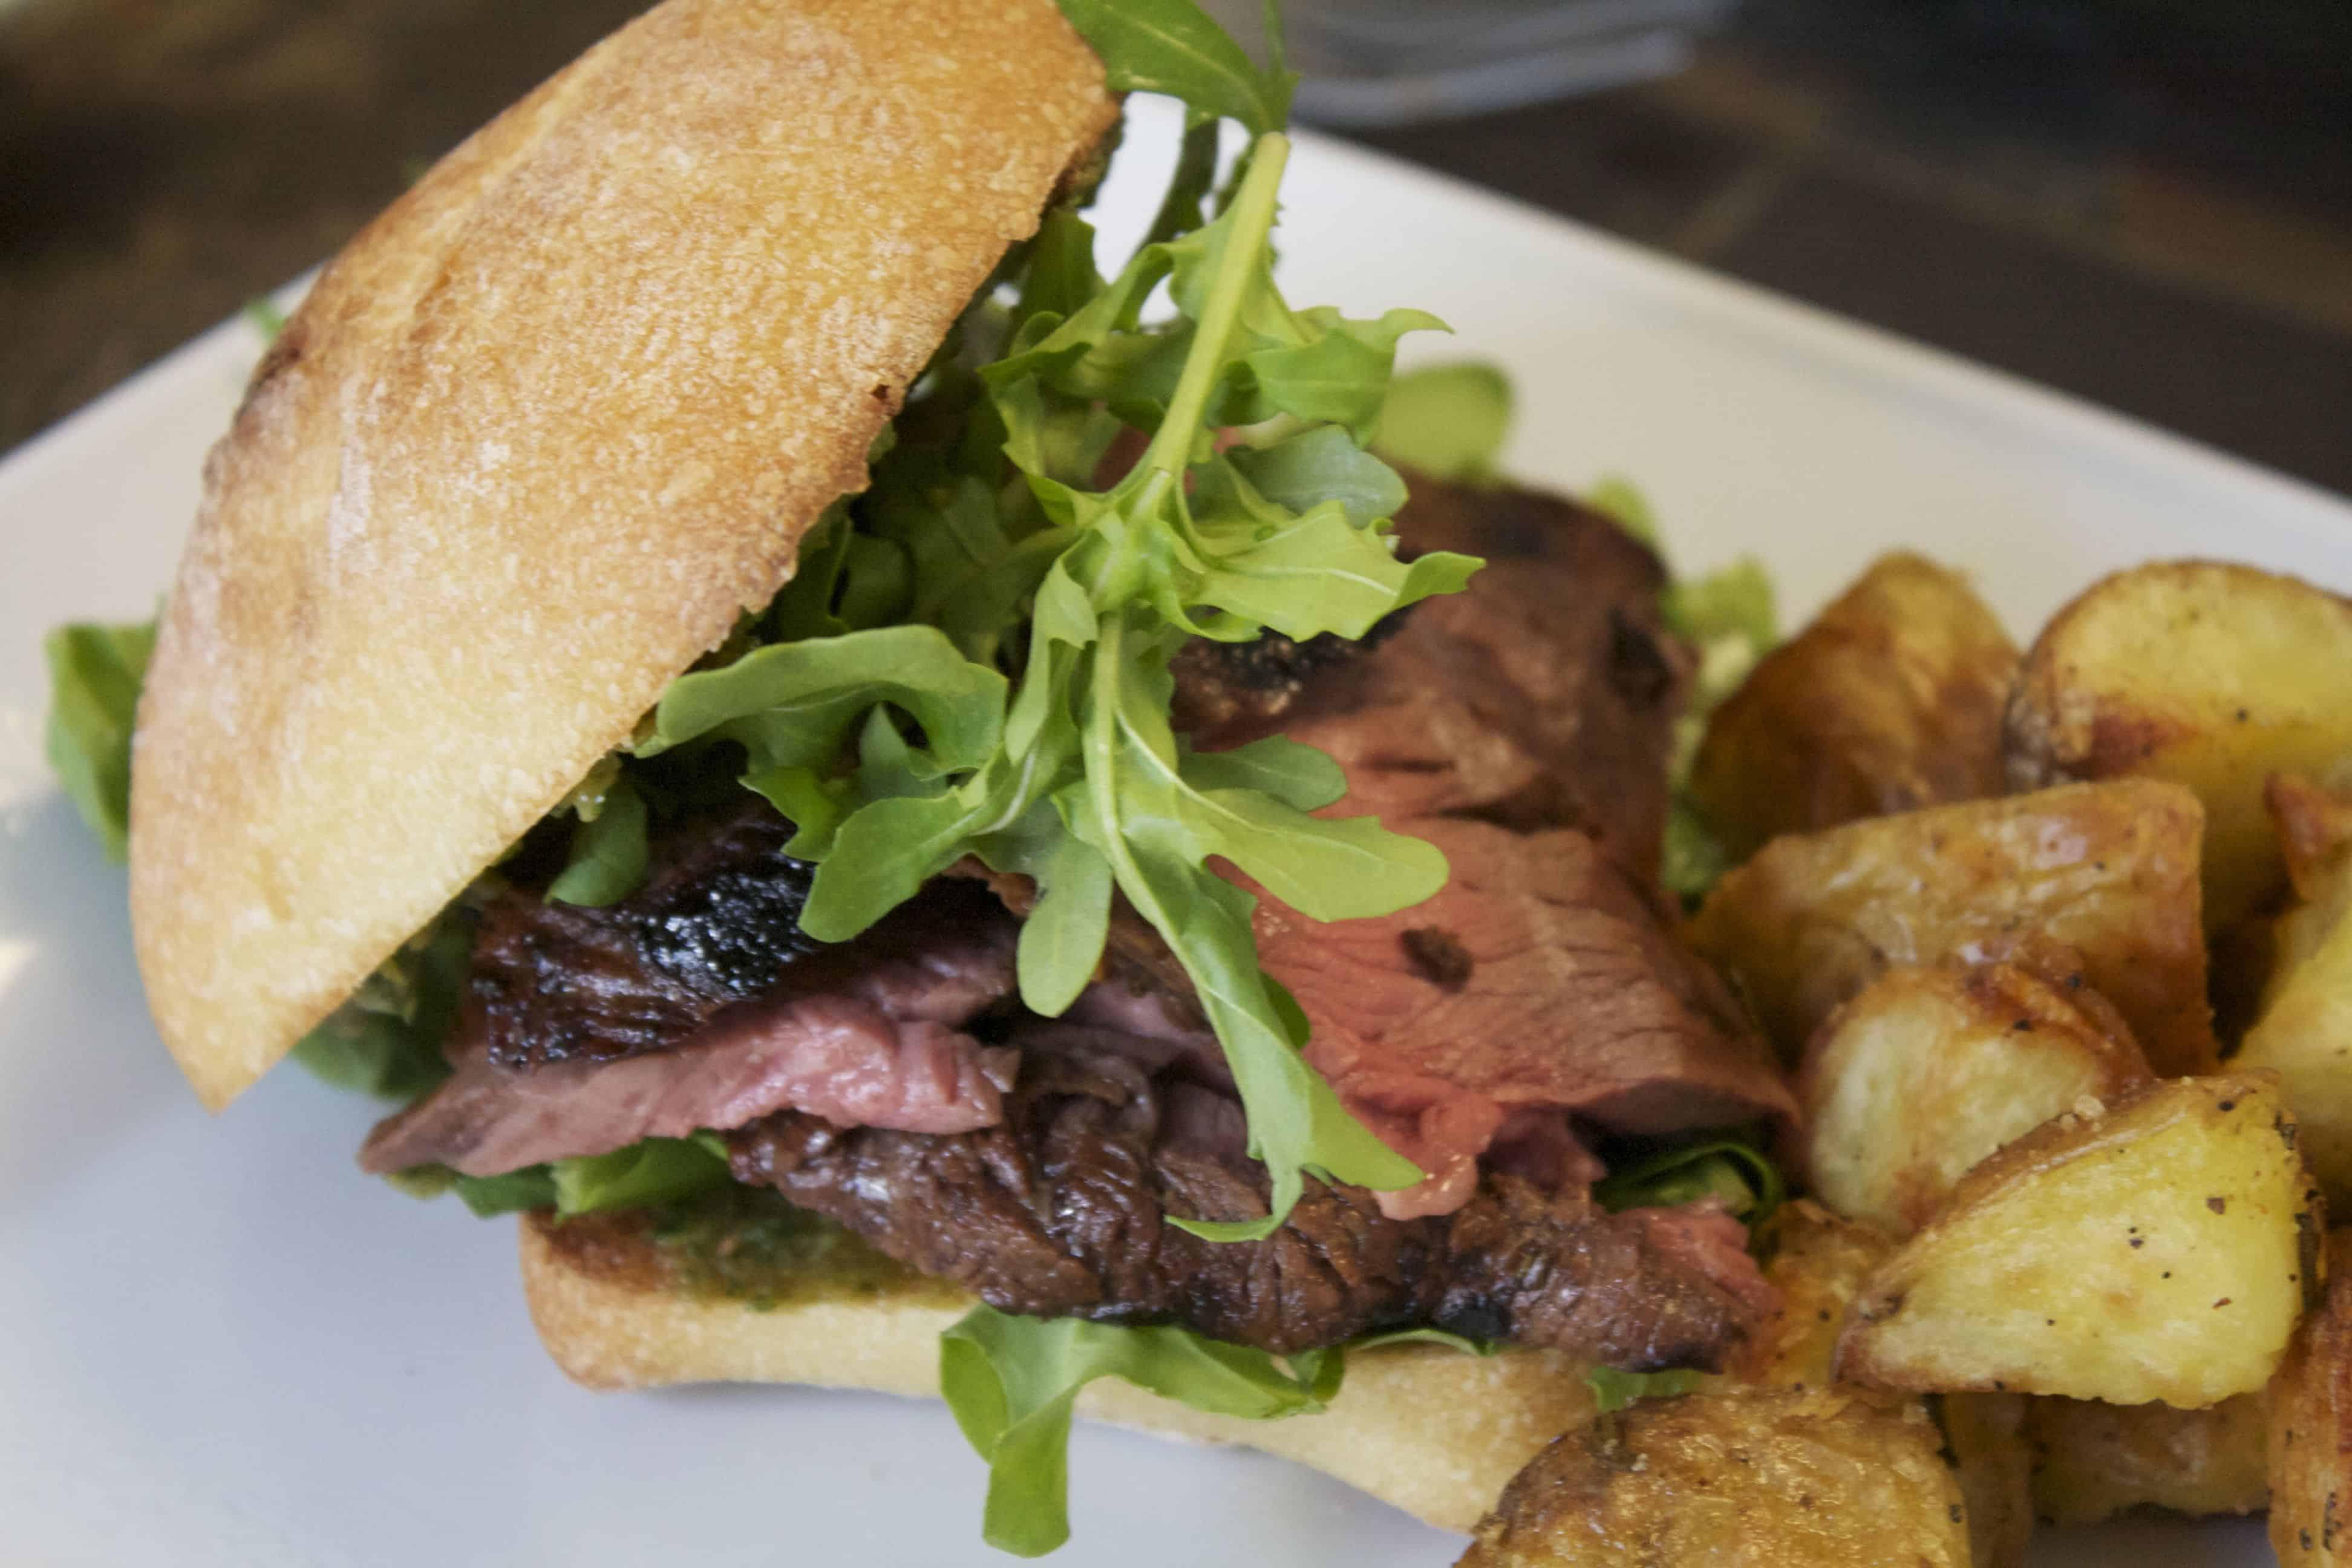 Flank Steak Sandwich with Arugula and Pesto